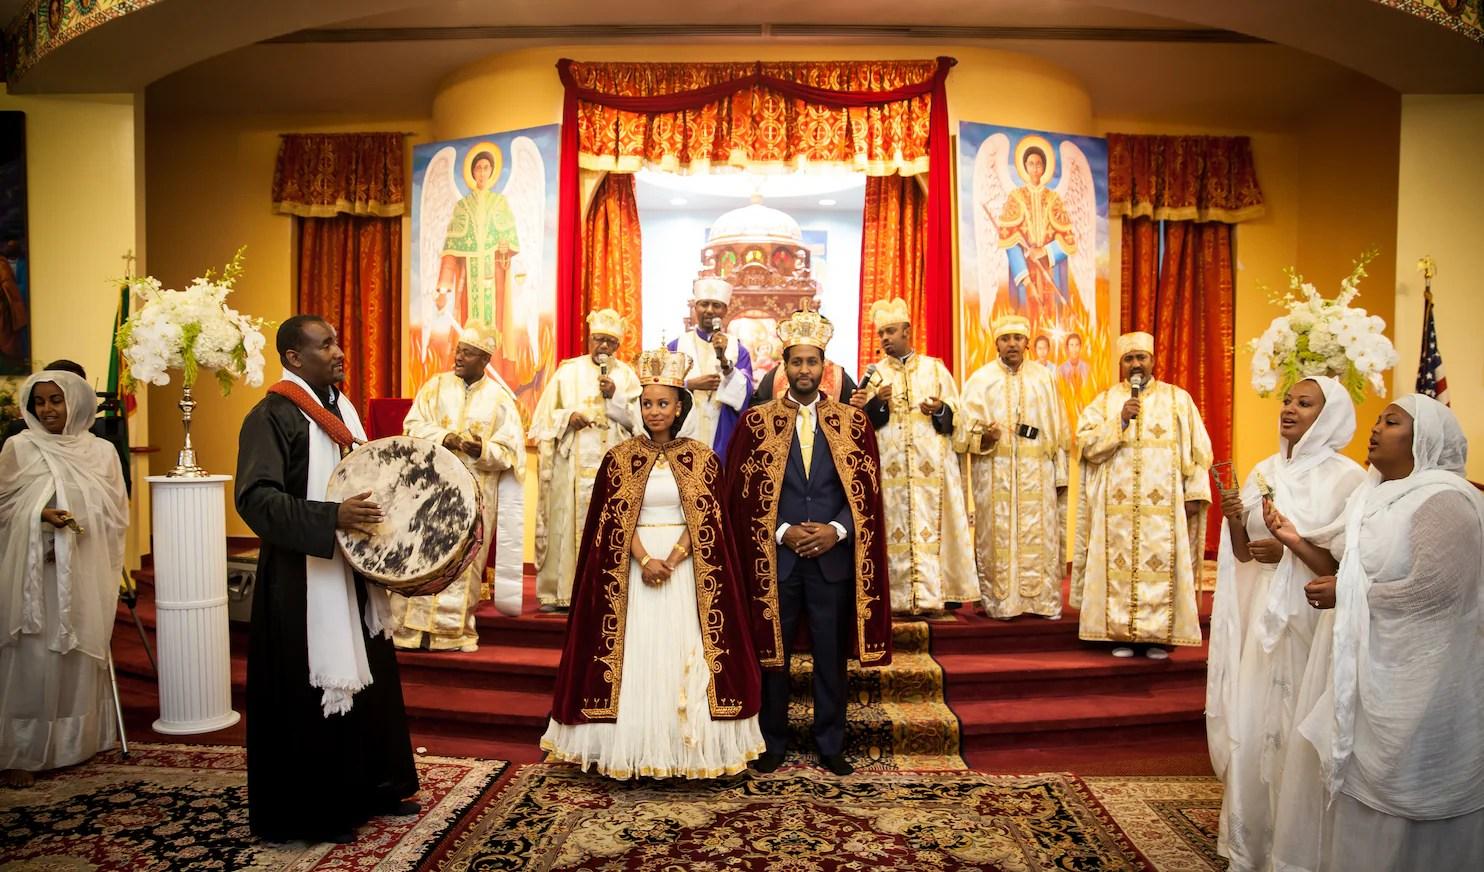 c story ethiopian wedding dress